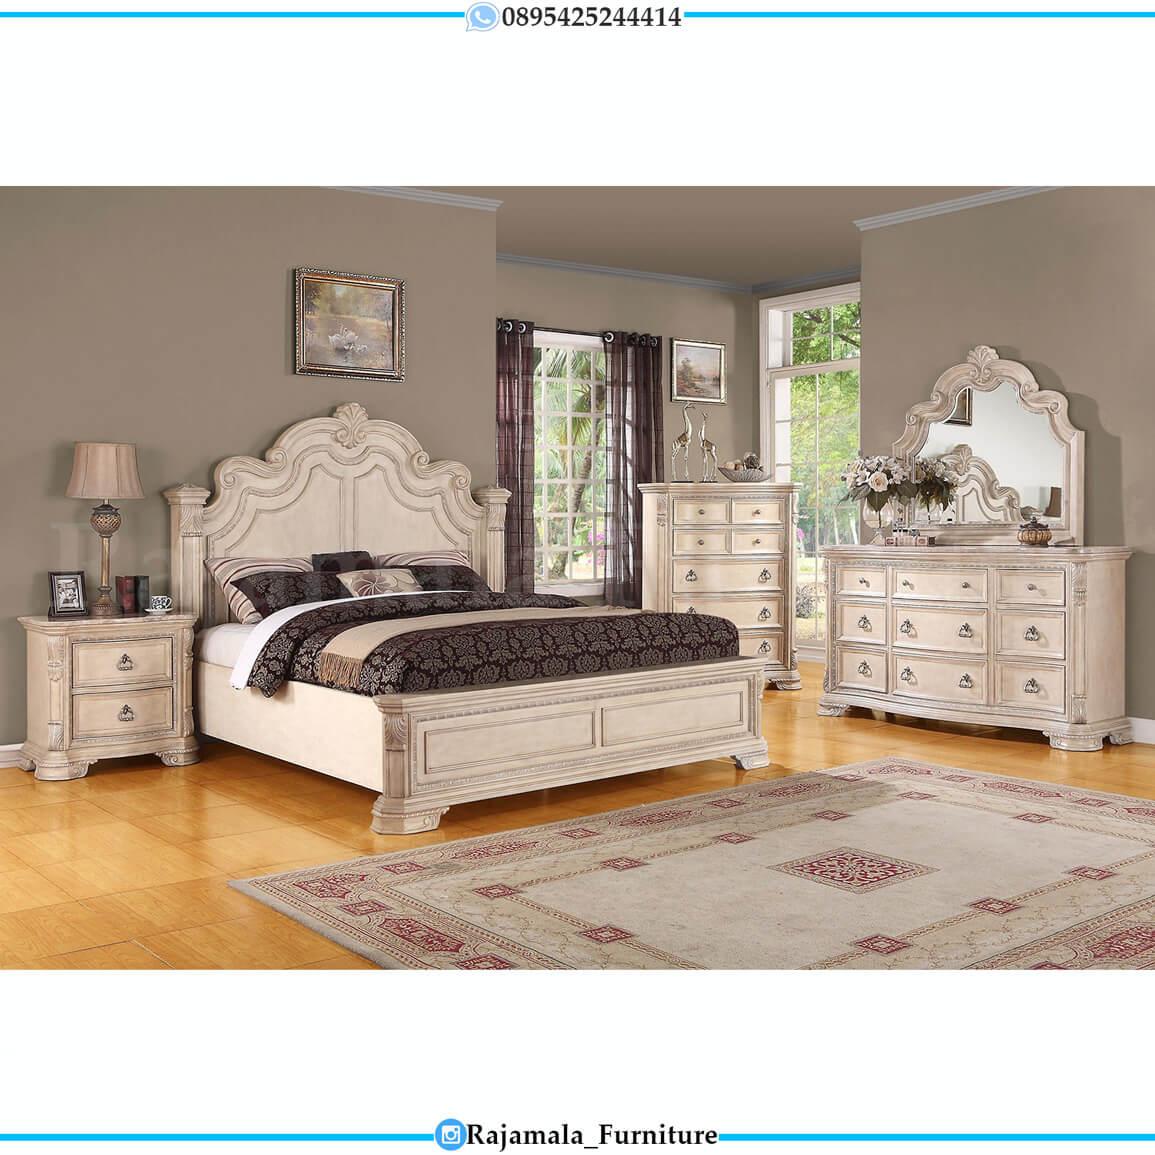 Jual Kamar Set Minimalis Terbaru Furniture Luxury Jepara RM-0219